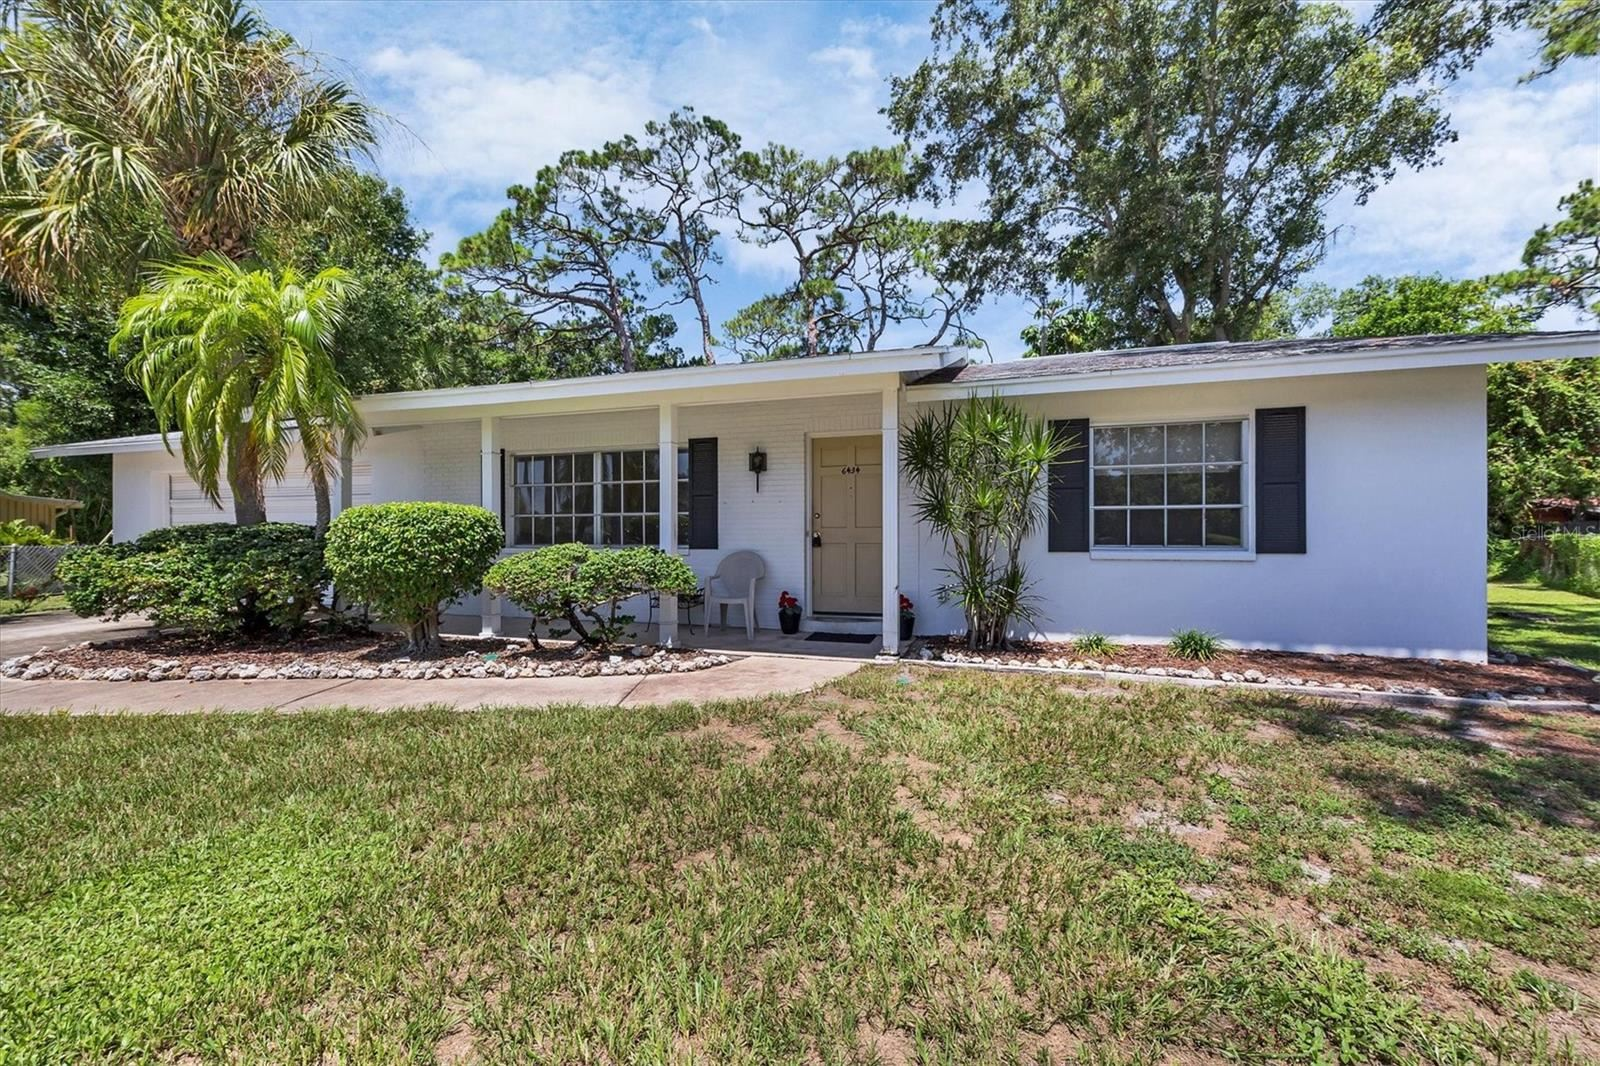 6434 COLONIAL DRIVE, Sarasota, FL 34231 - #: N6116868